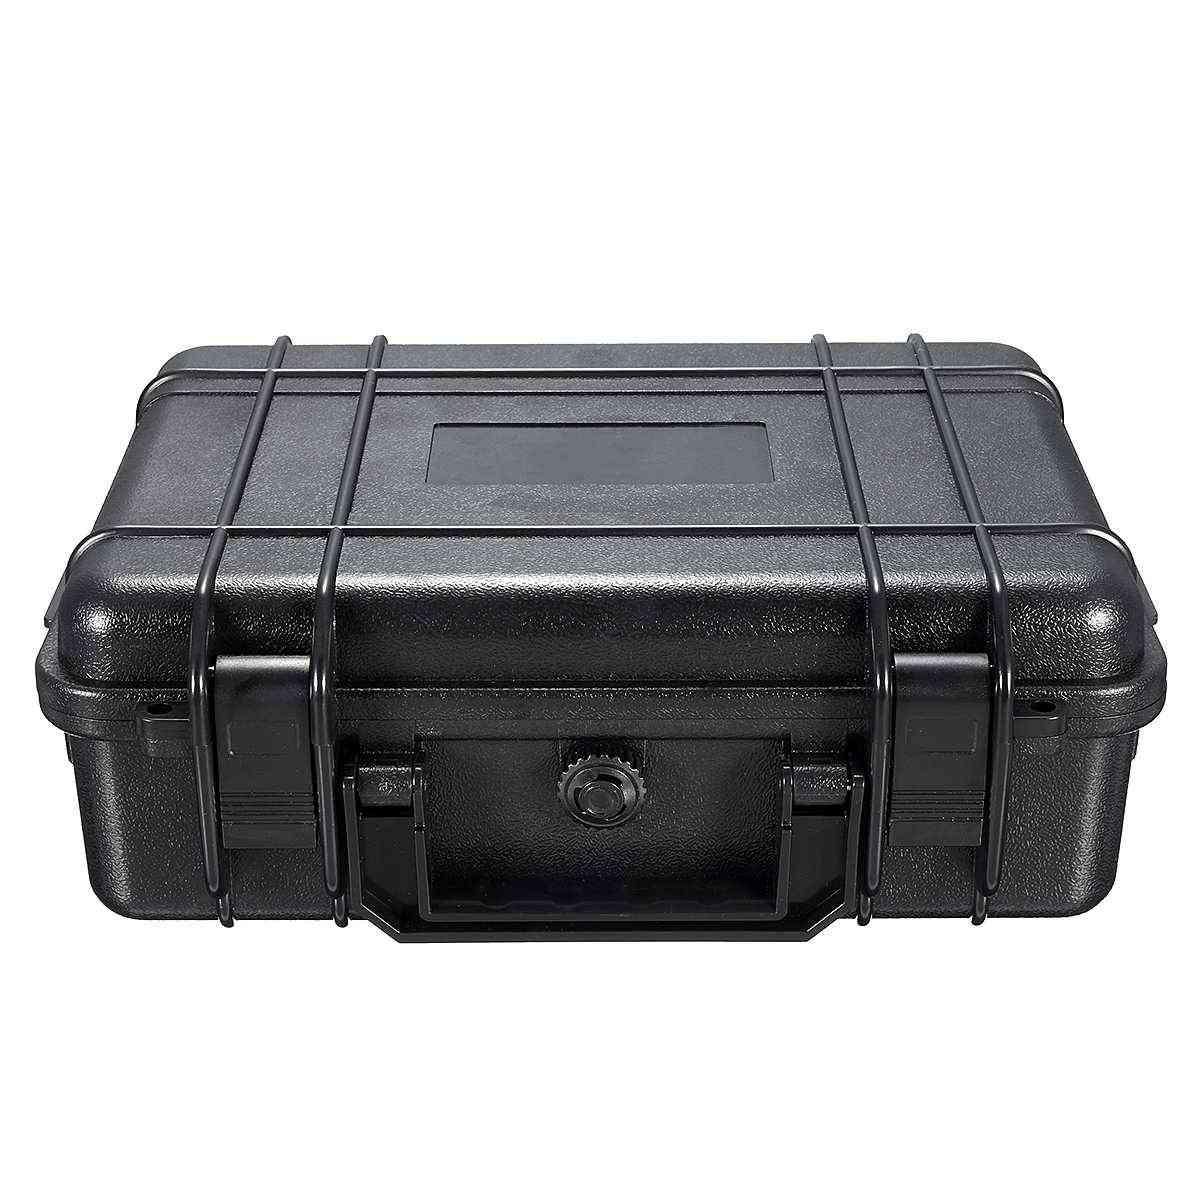 Waterproof Hard Carry Case / Bag Tool Kits With Sponge